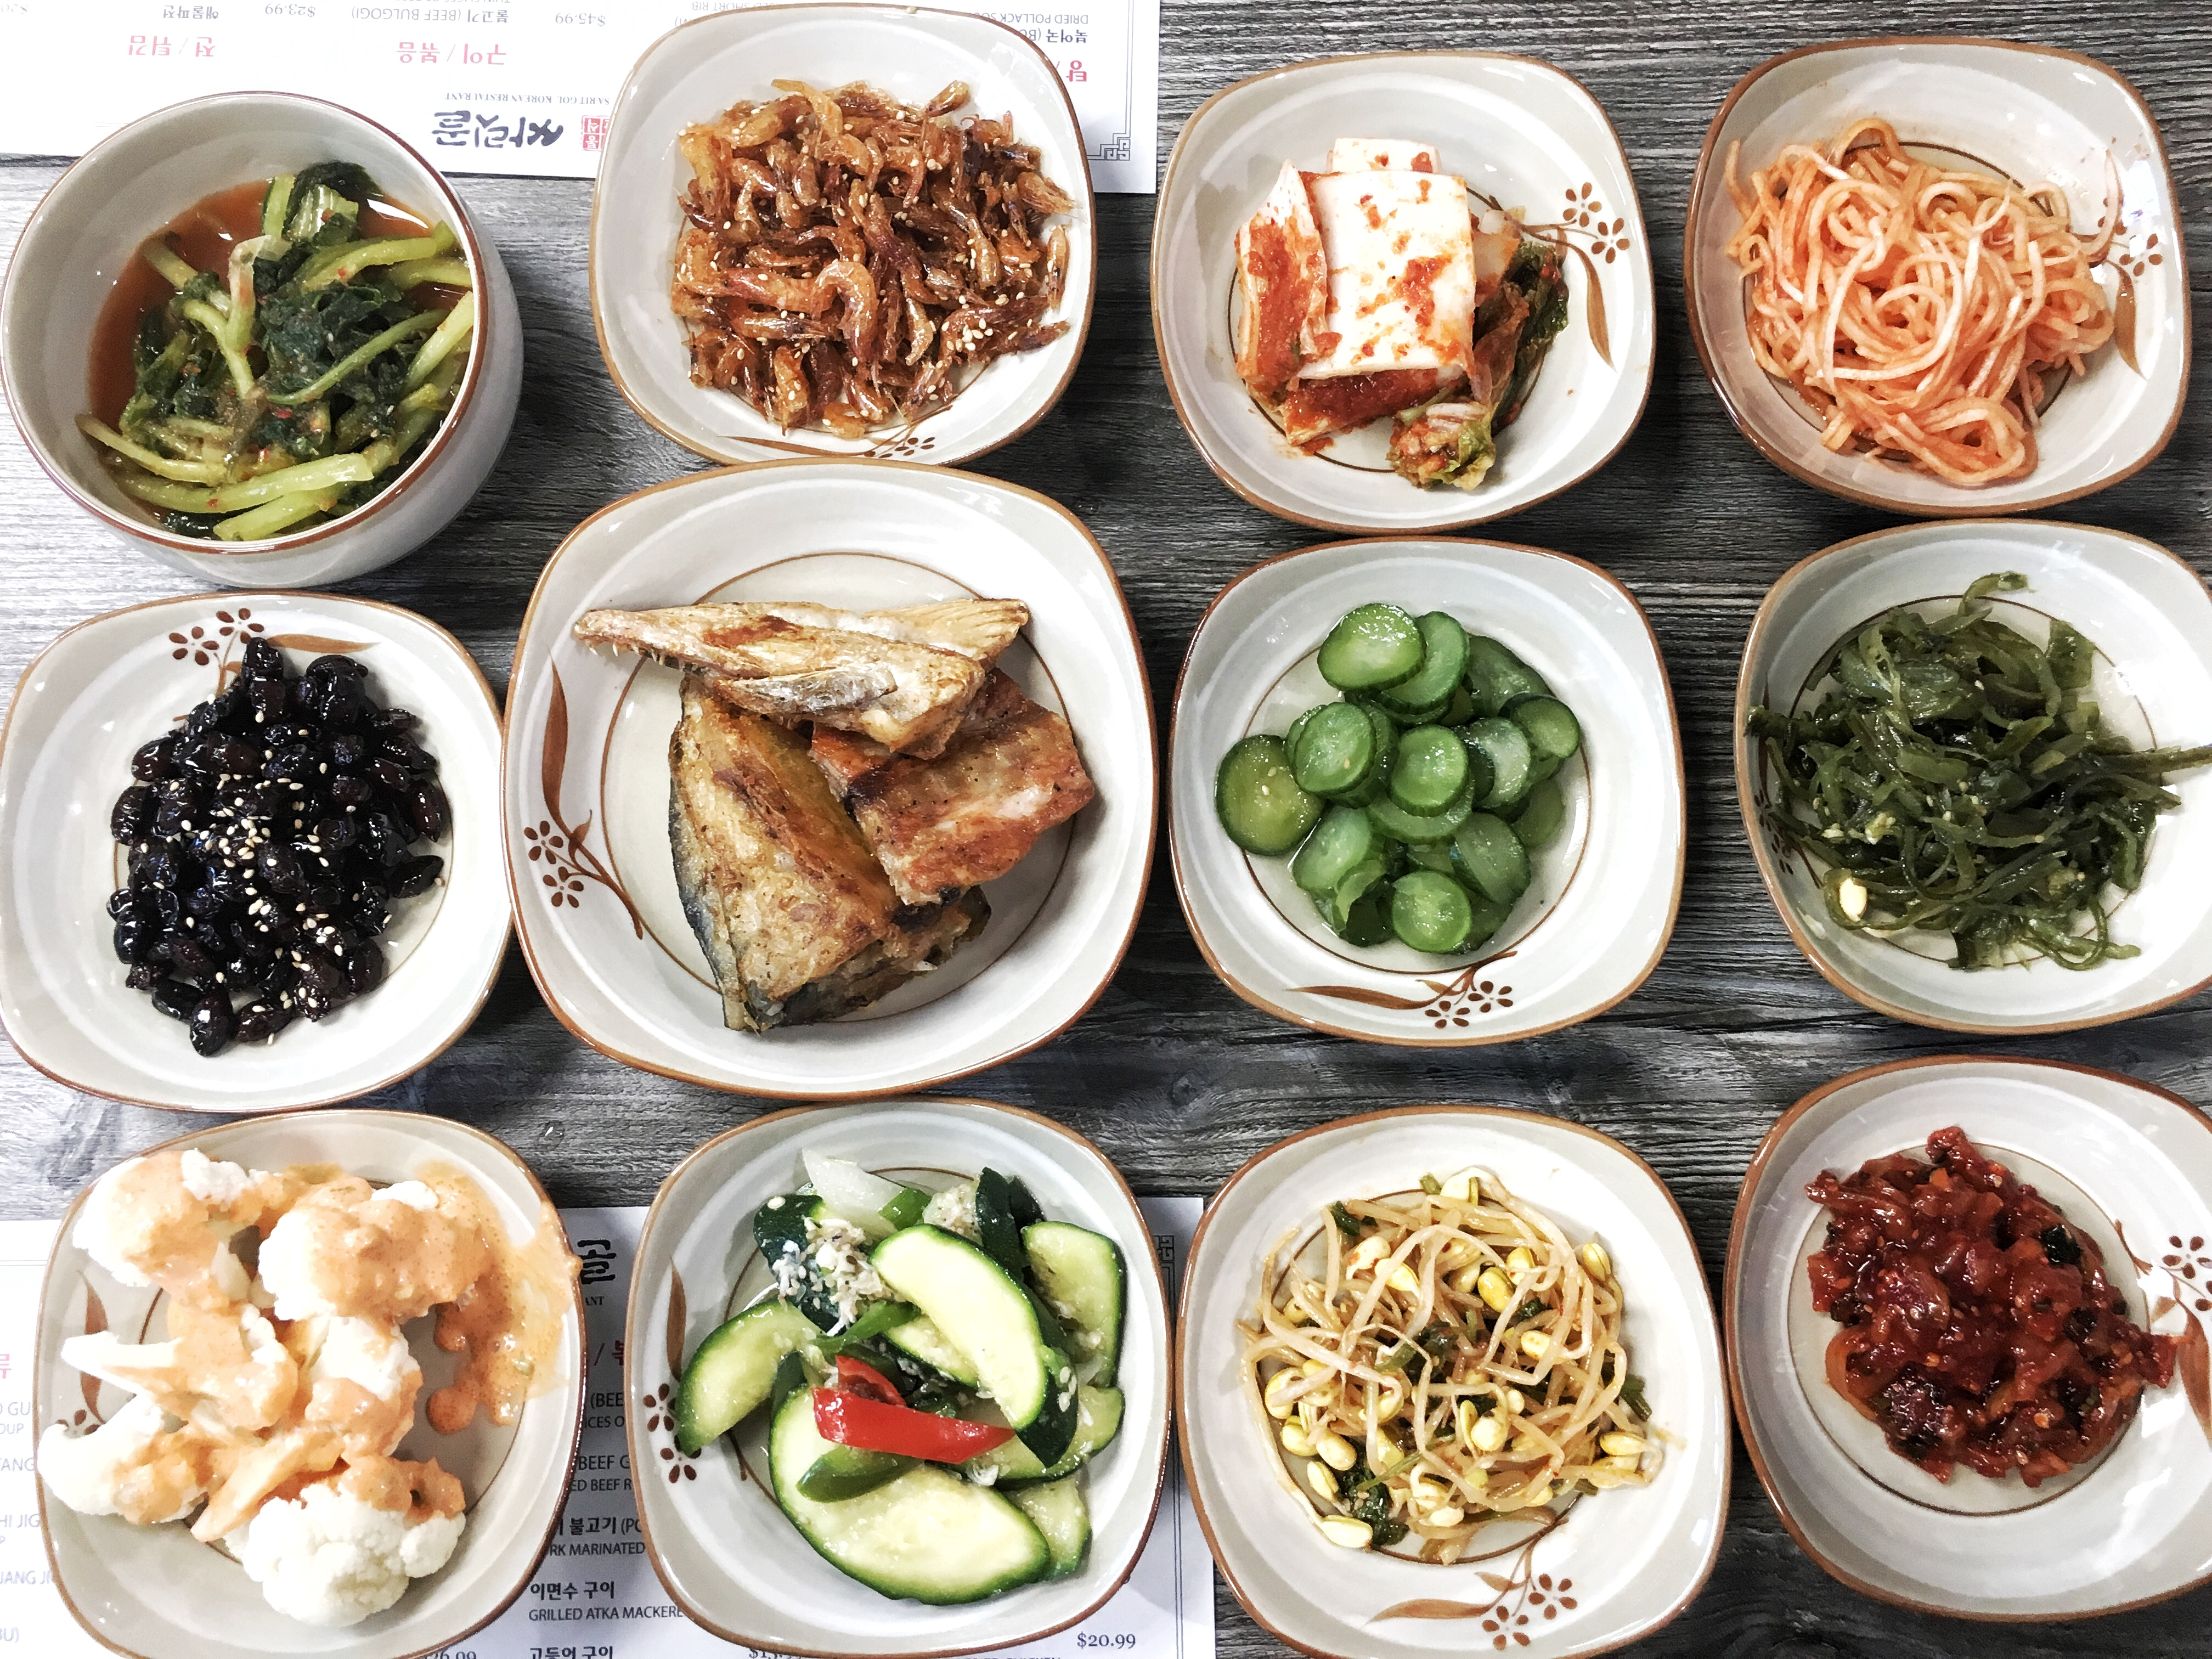 Banchan at a Korean restaurant in Los Angeles.